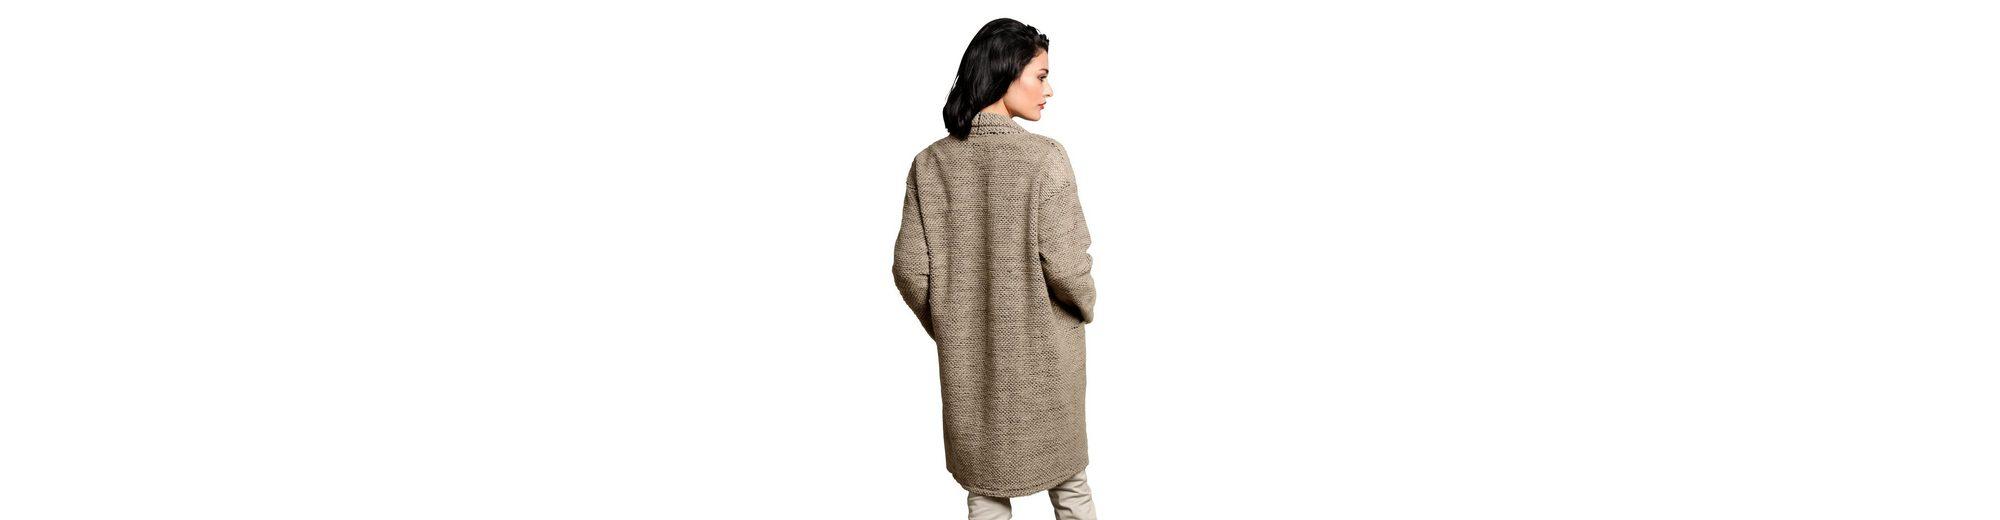 Alba Moda Mantel in Oversizedform Rabatt Erwerben Xu1nqw2kHZ